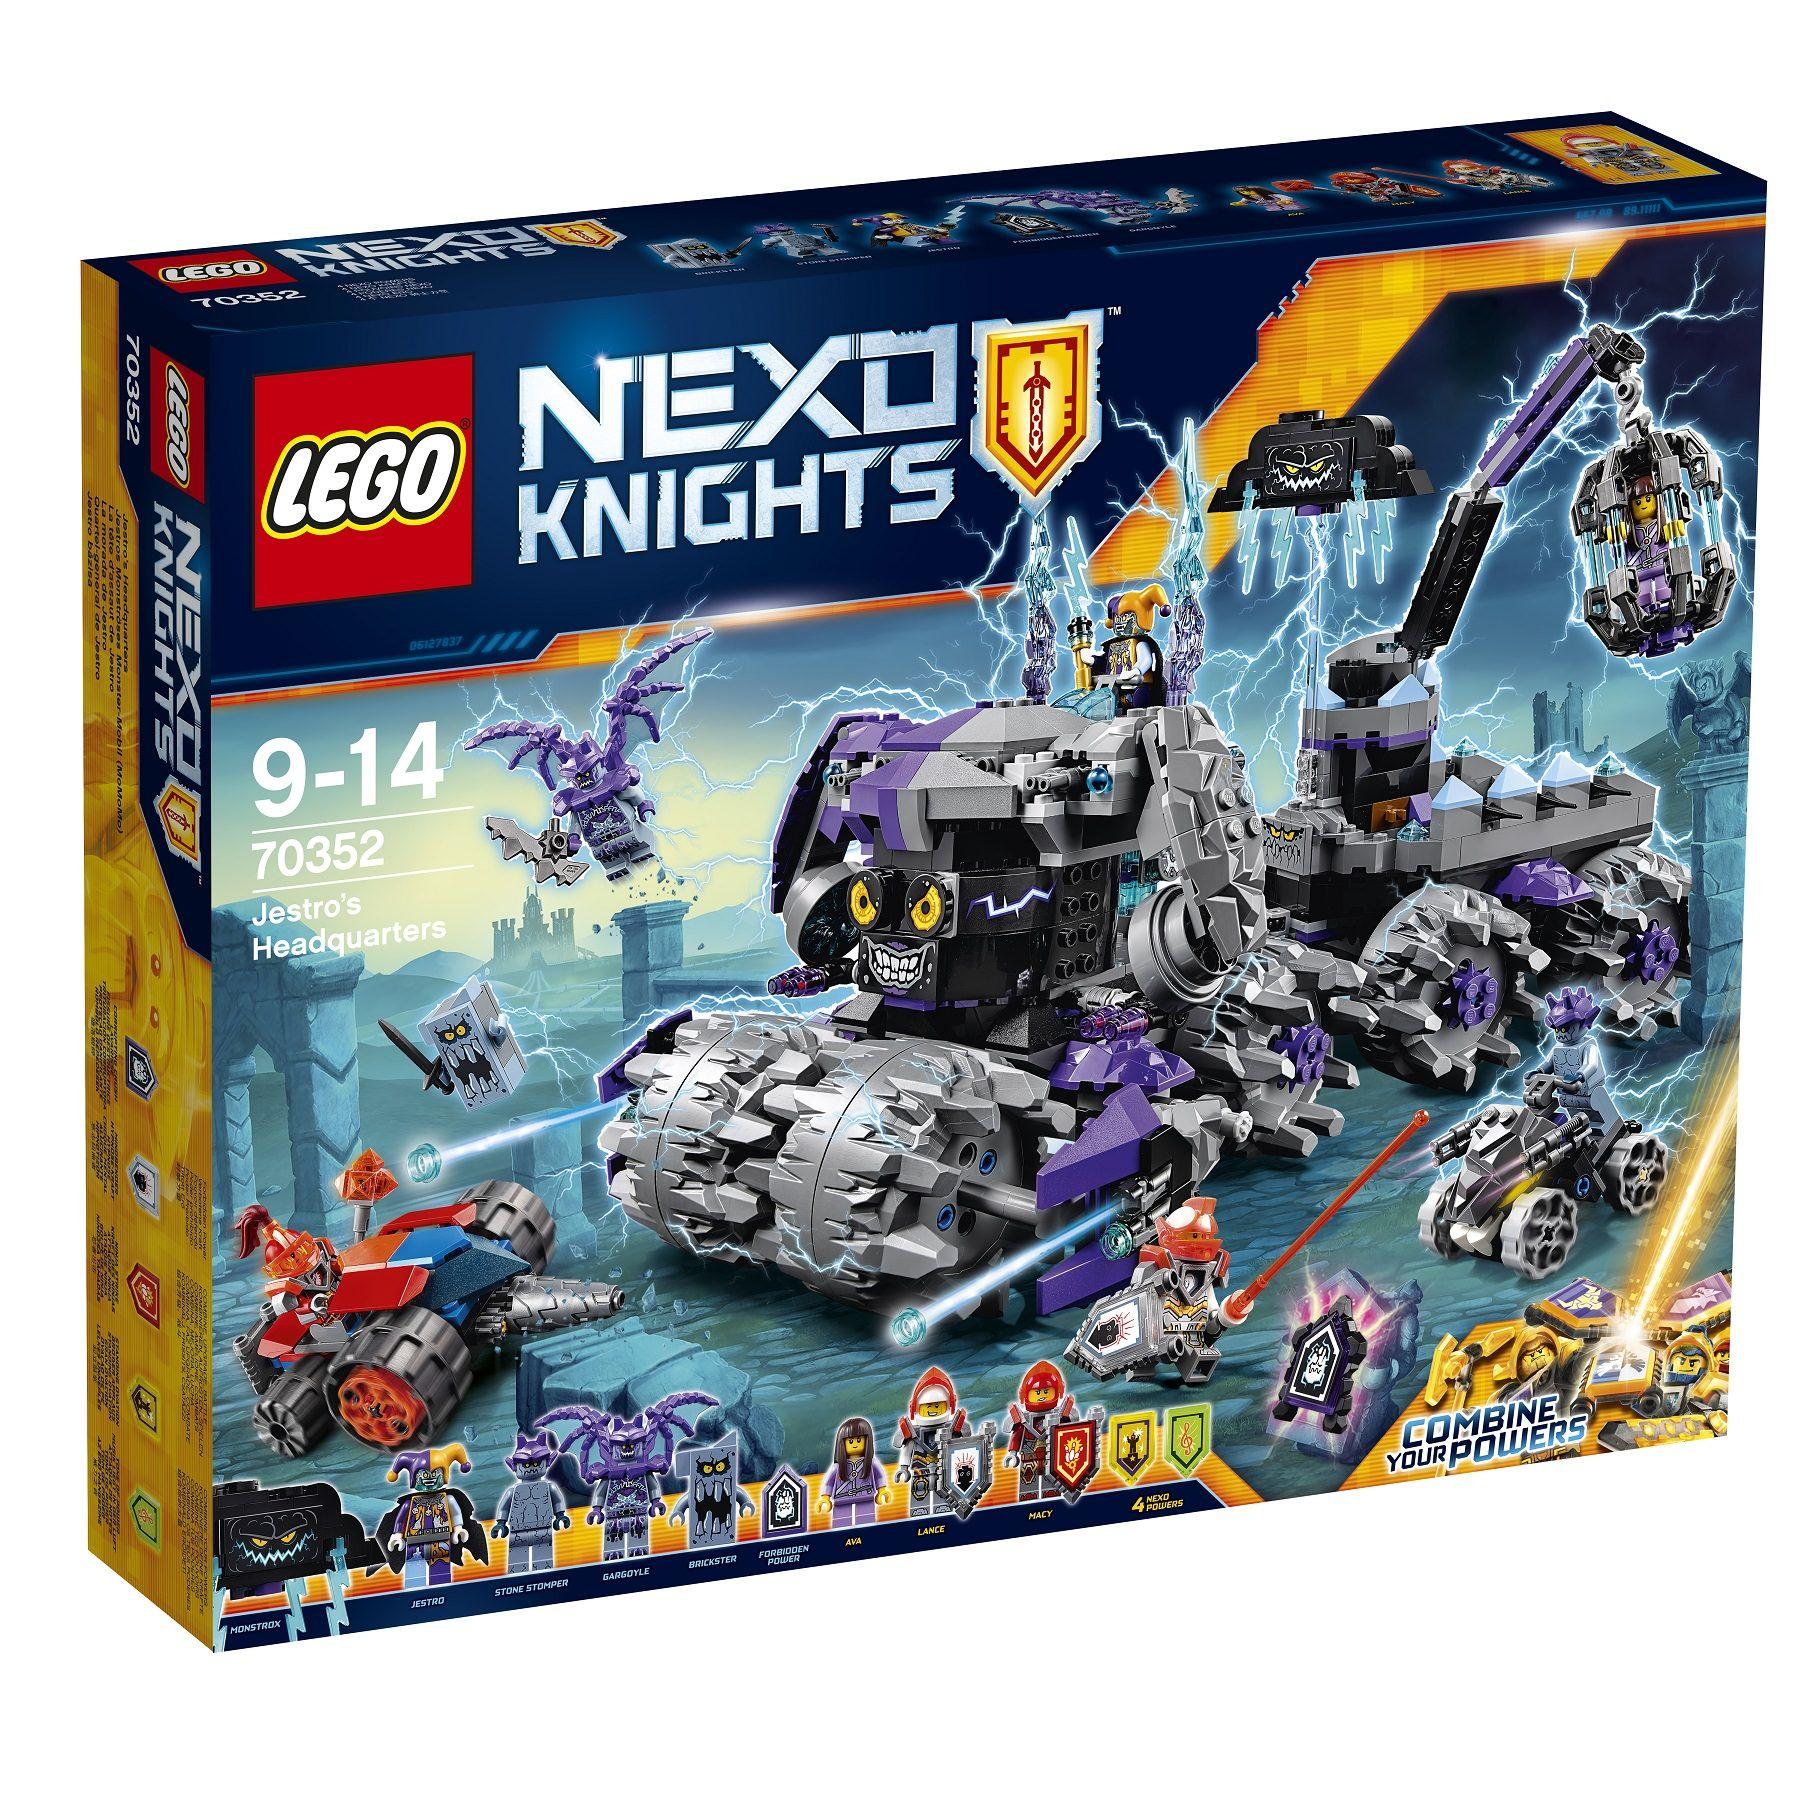 Jestros Monströses Monster-Mobil (MoMoMo) 70352 LEGO Nexo Knights